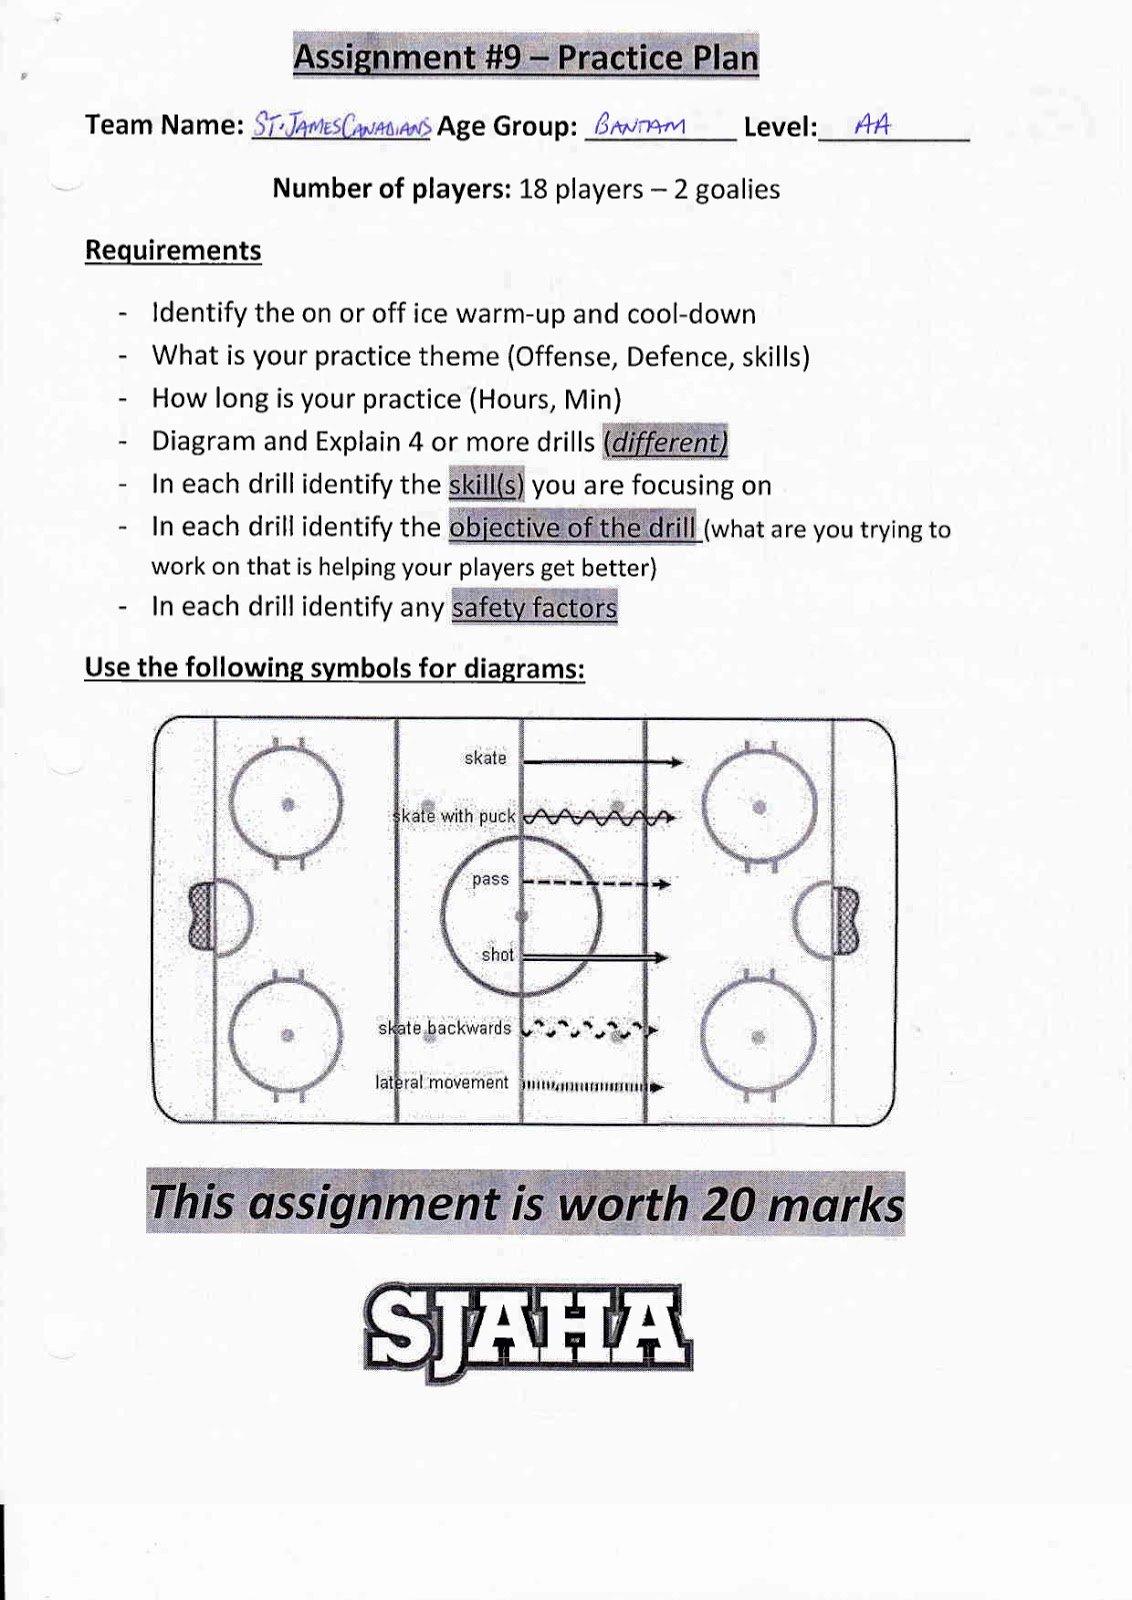 Hockey Practice Plan Template Fresh St James assiniboia Hockey Academy Grade 11